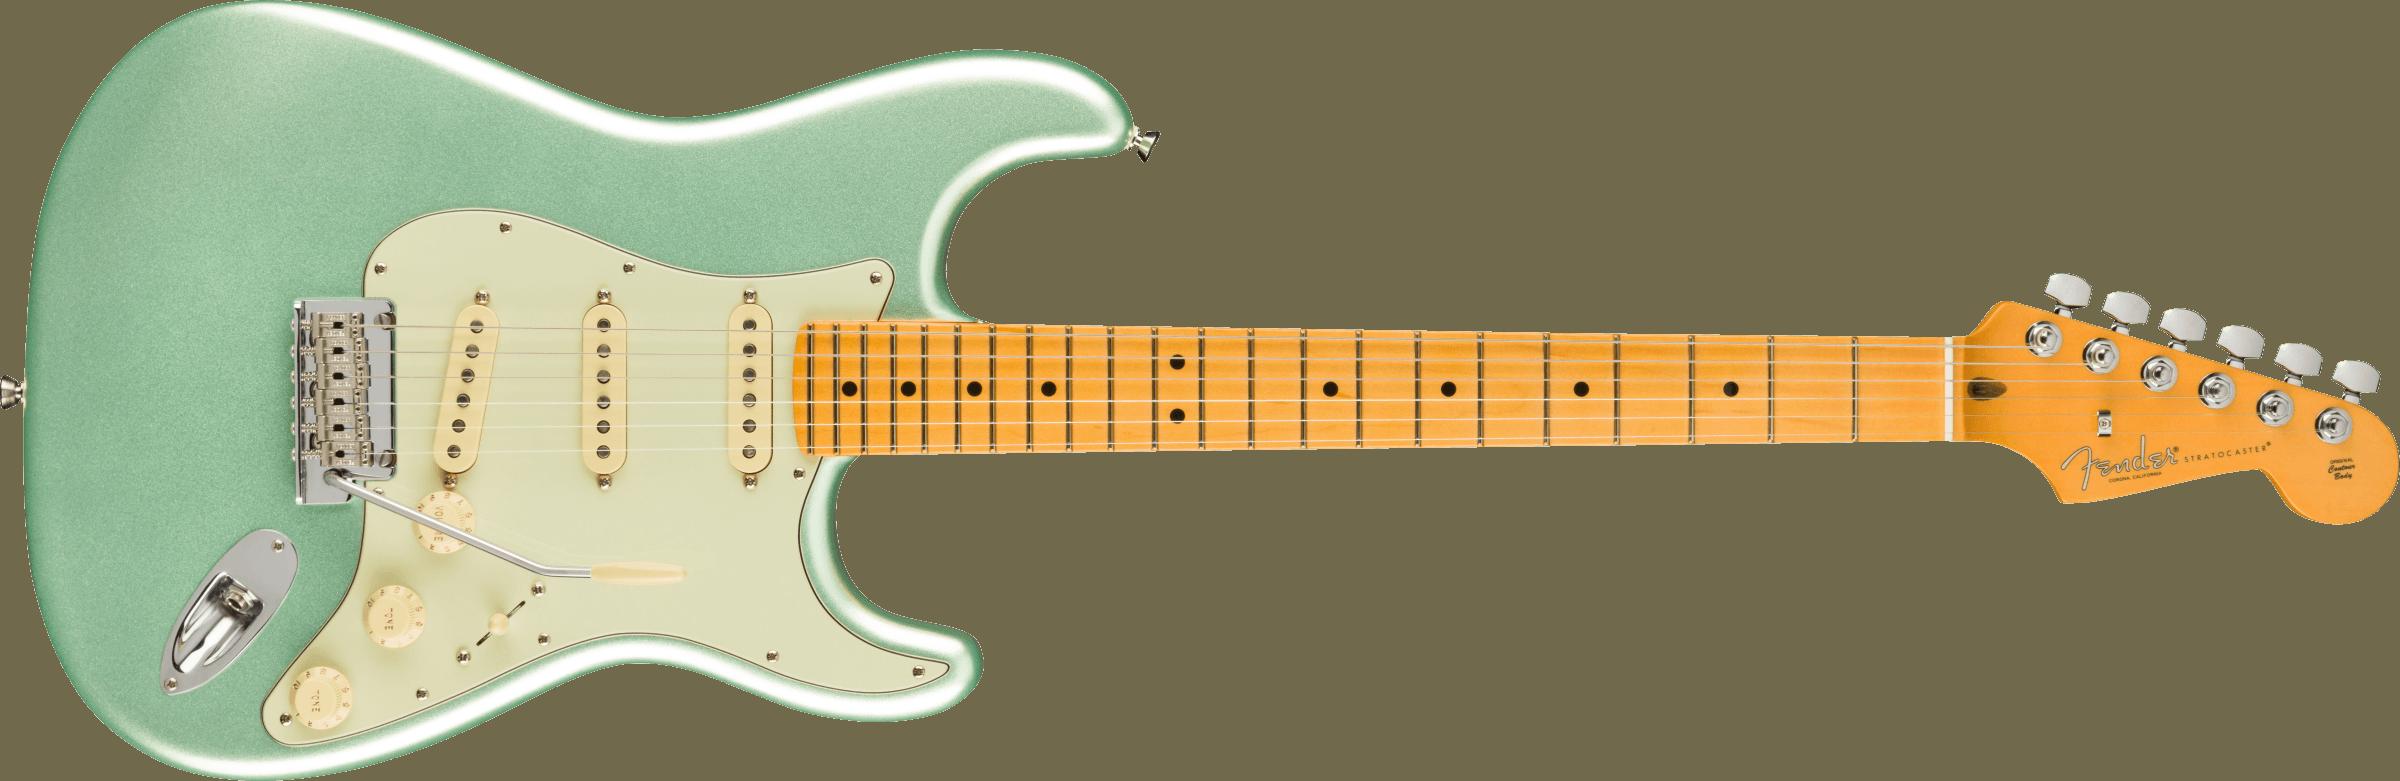 FENDER-American-Professional-II-Stratocaster-Maple-Fingerboard-Mystic-Surf-Green-sku-571005524